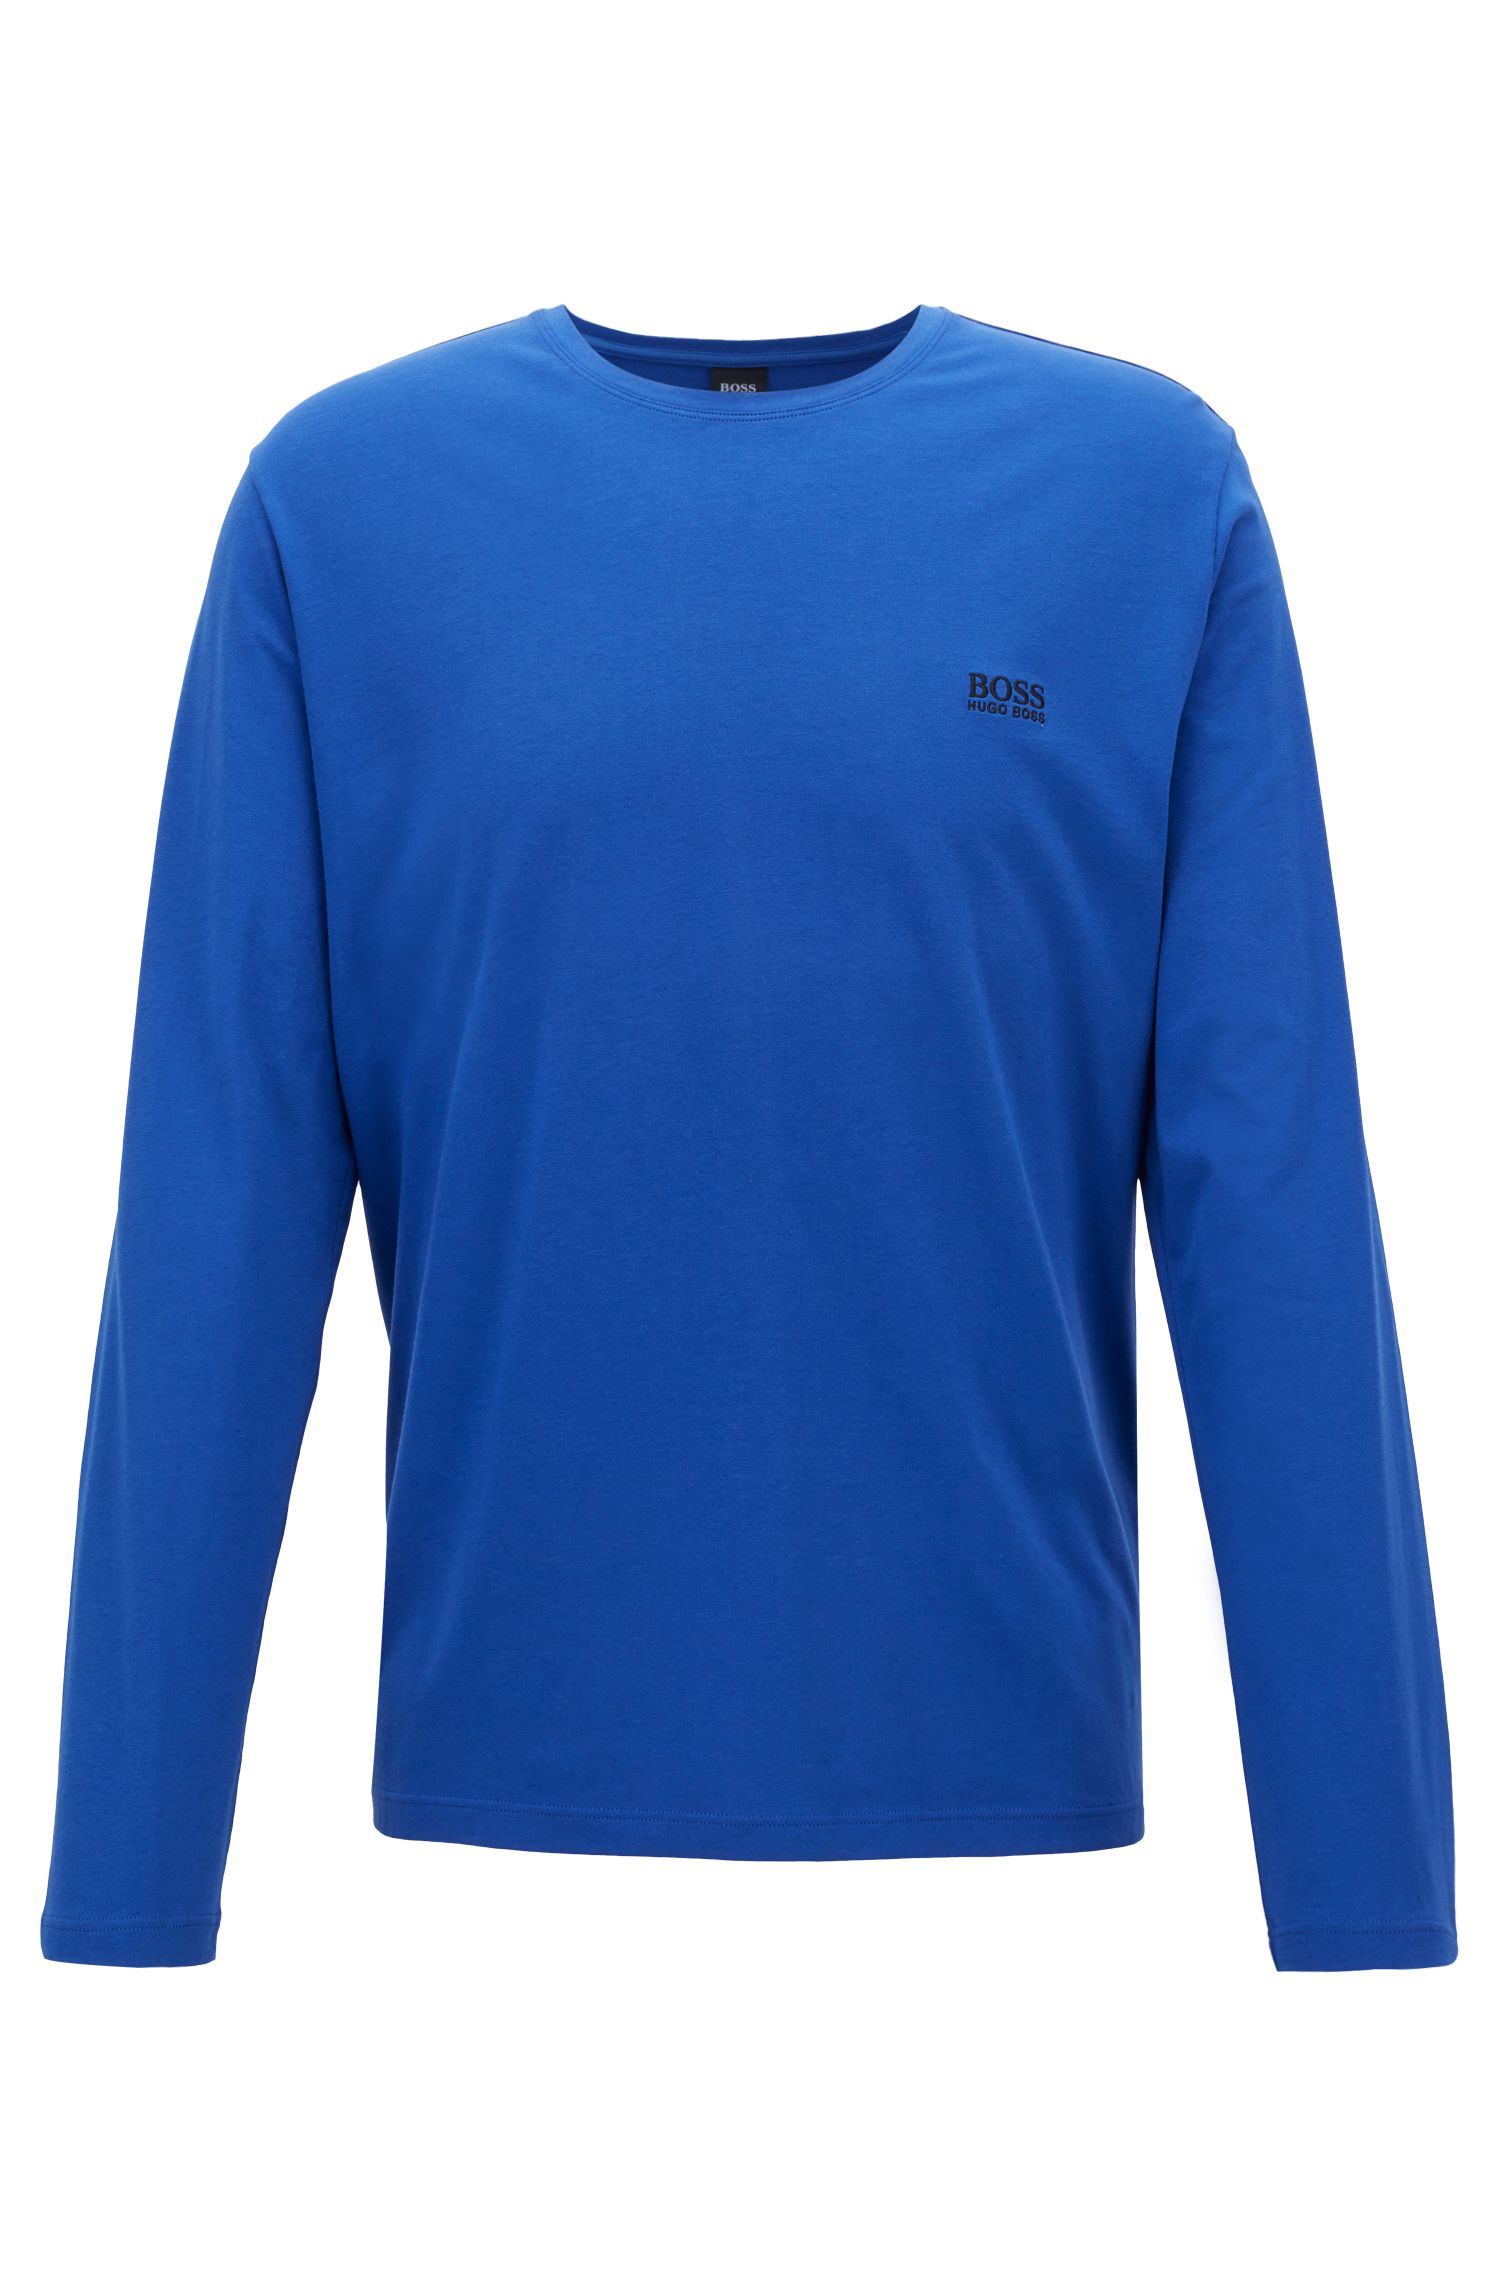 Regular-fit loungewear top in stretch cotton jersey, Open Blue